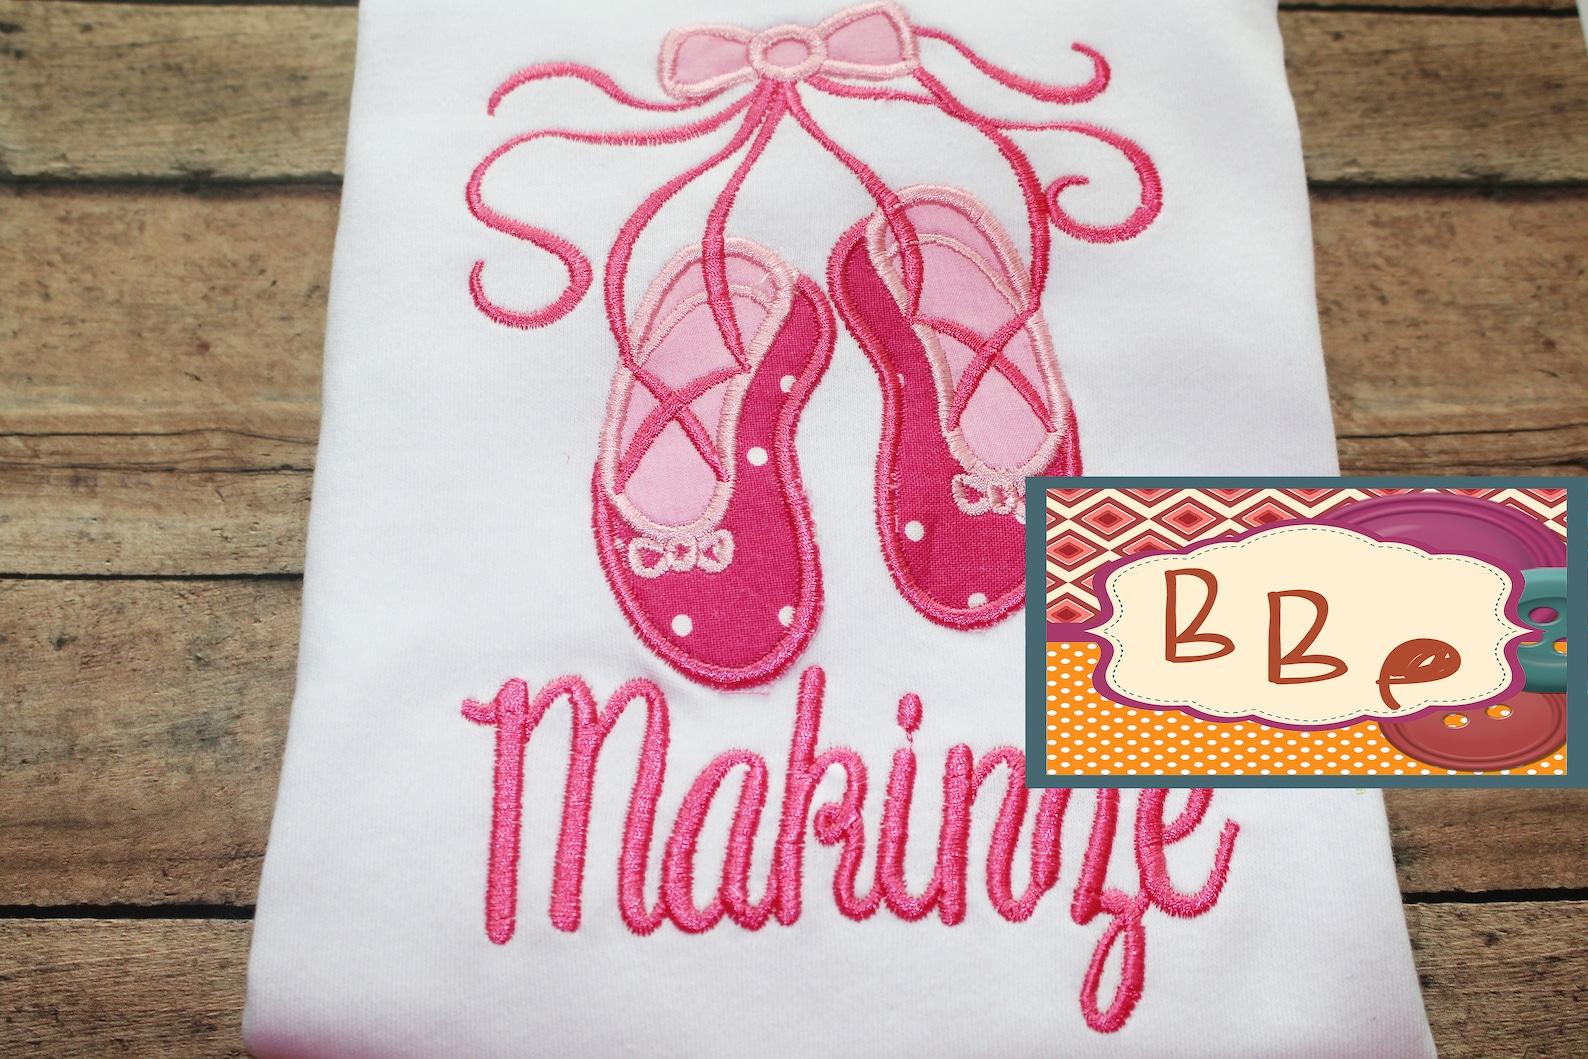 ballet shoes shirt embroidered - ballerina girl top